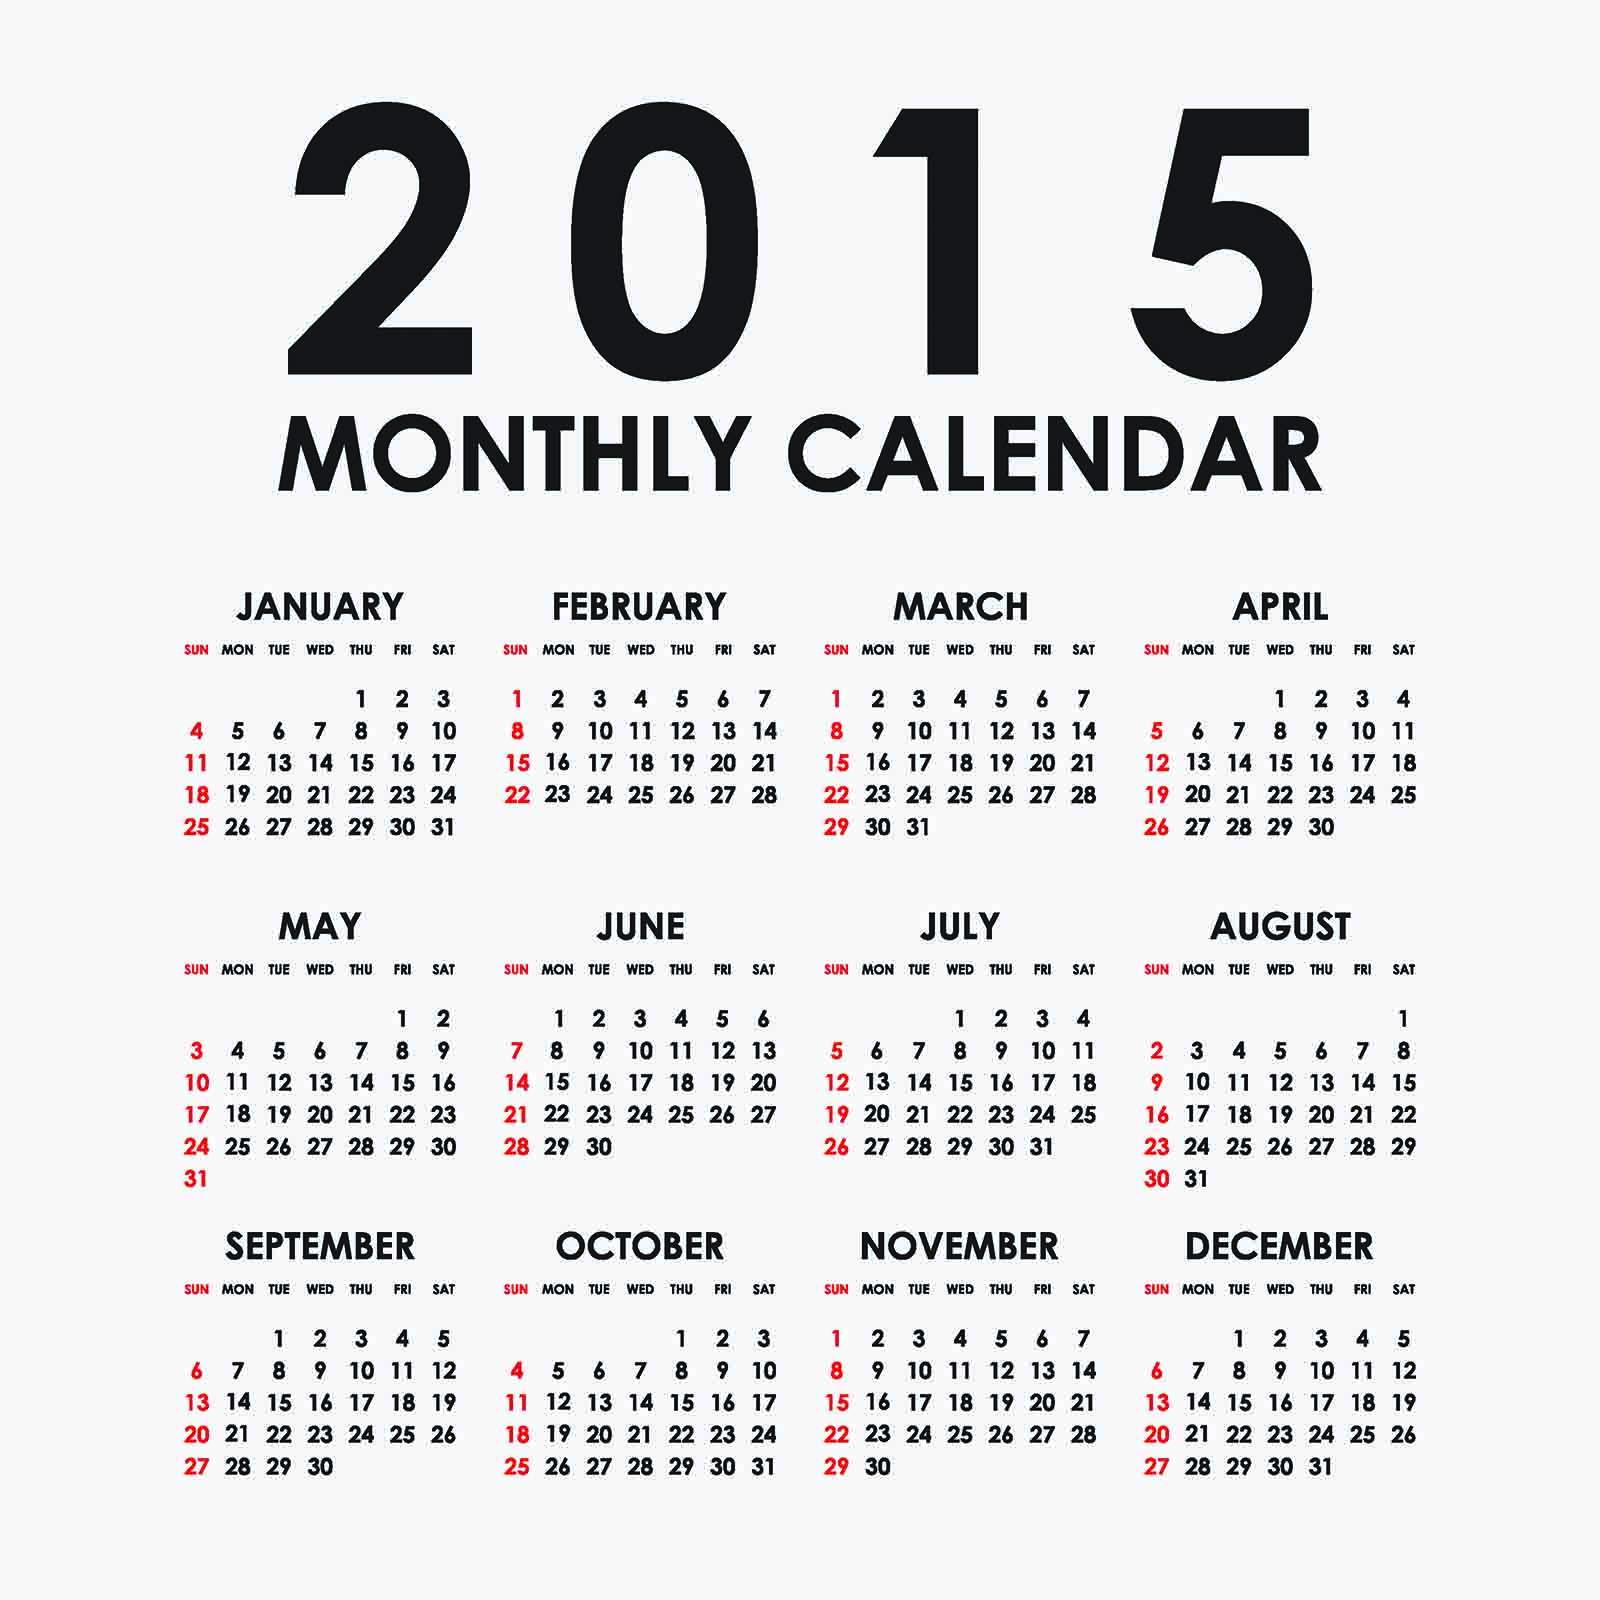 2015 Monthly Calendar Vector : カレンダー 2015 年間 無料 : カレンダー